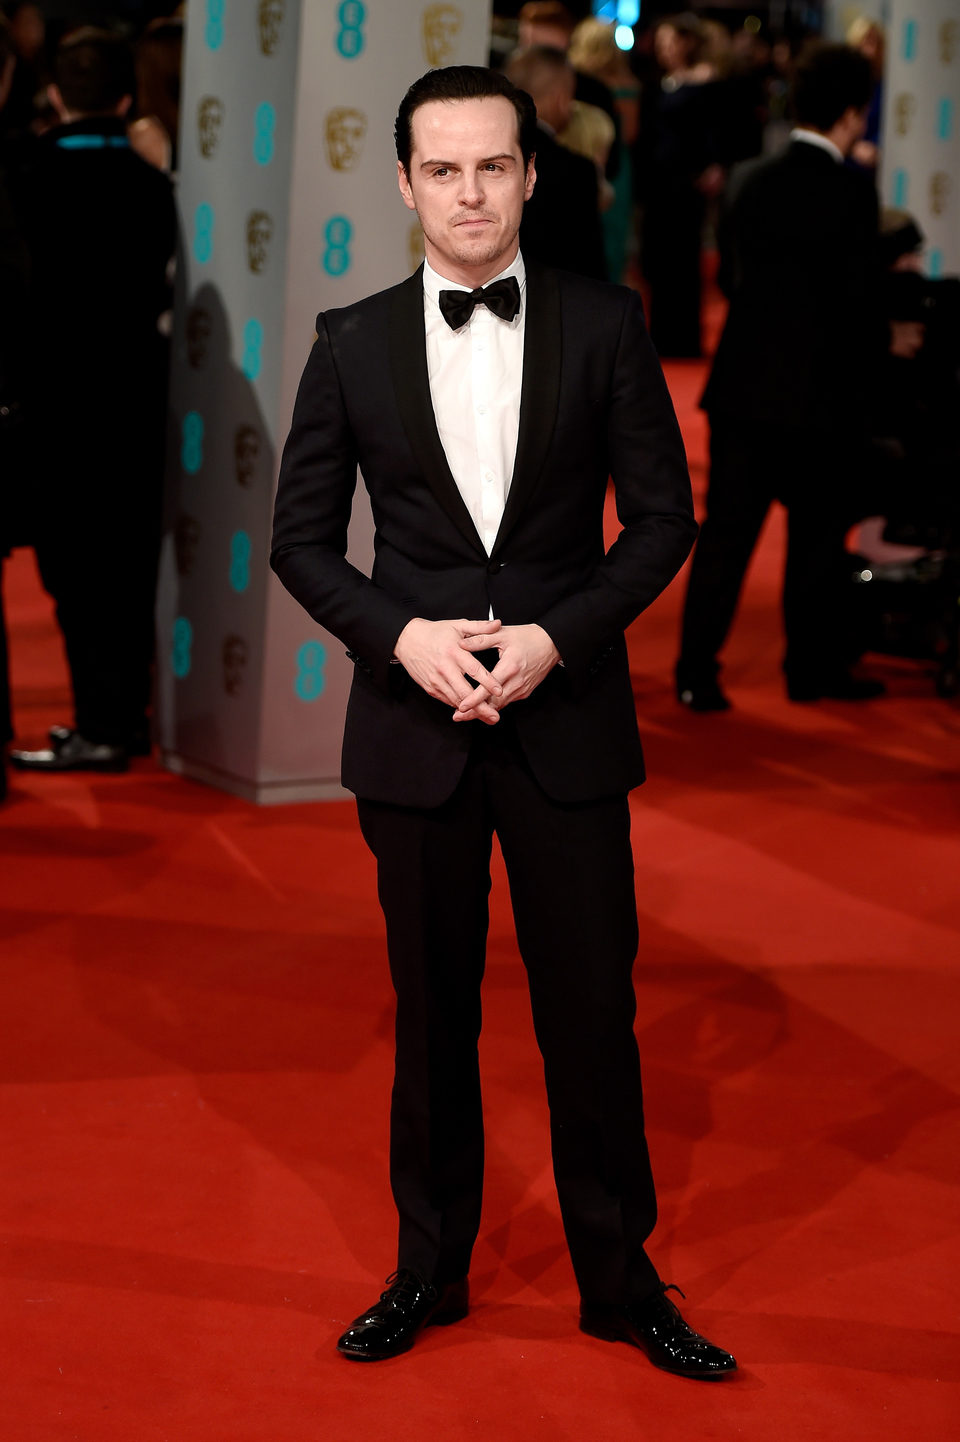 Andrew Scott at the 2015 BAFTA Awards